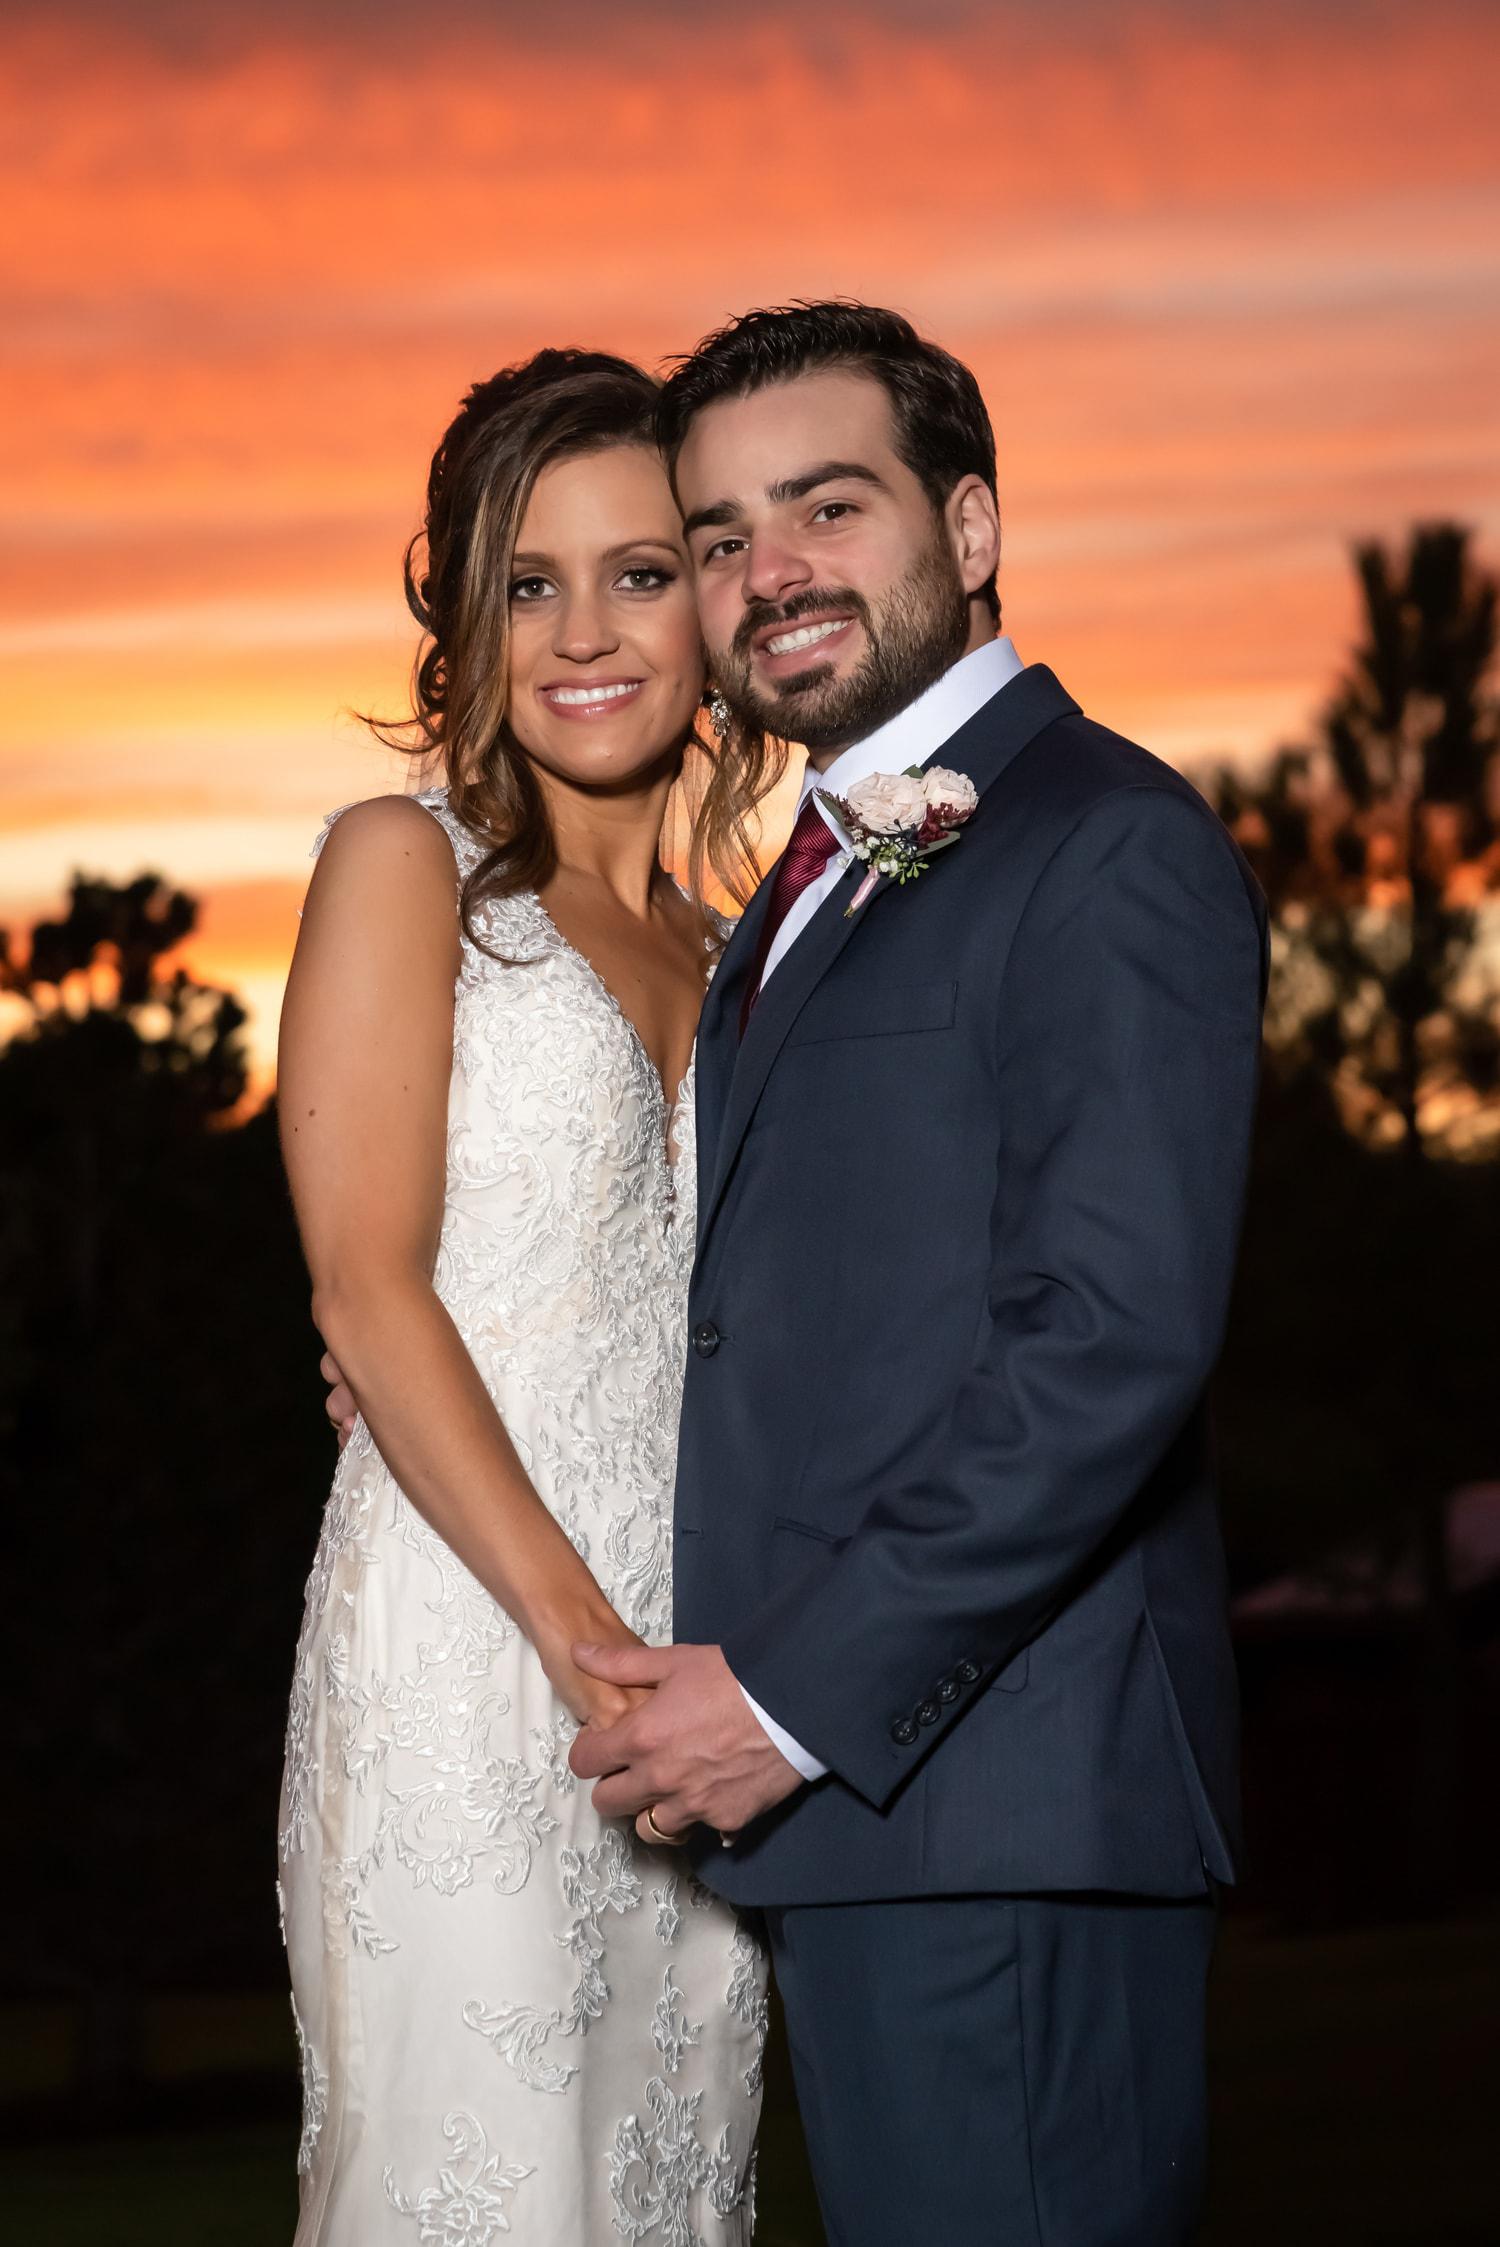 bride-groom-formal-portrait-sunset-orange-beautiful-chadandbriephotography.jpg